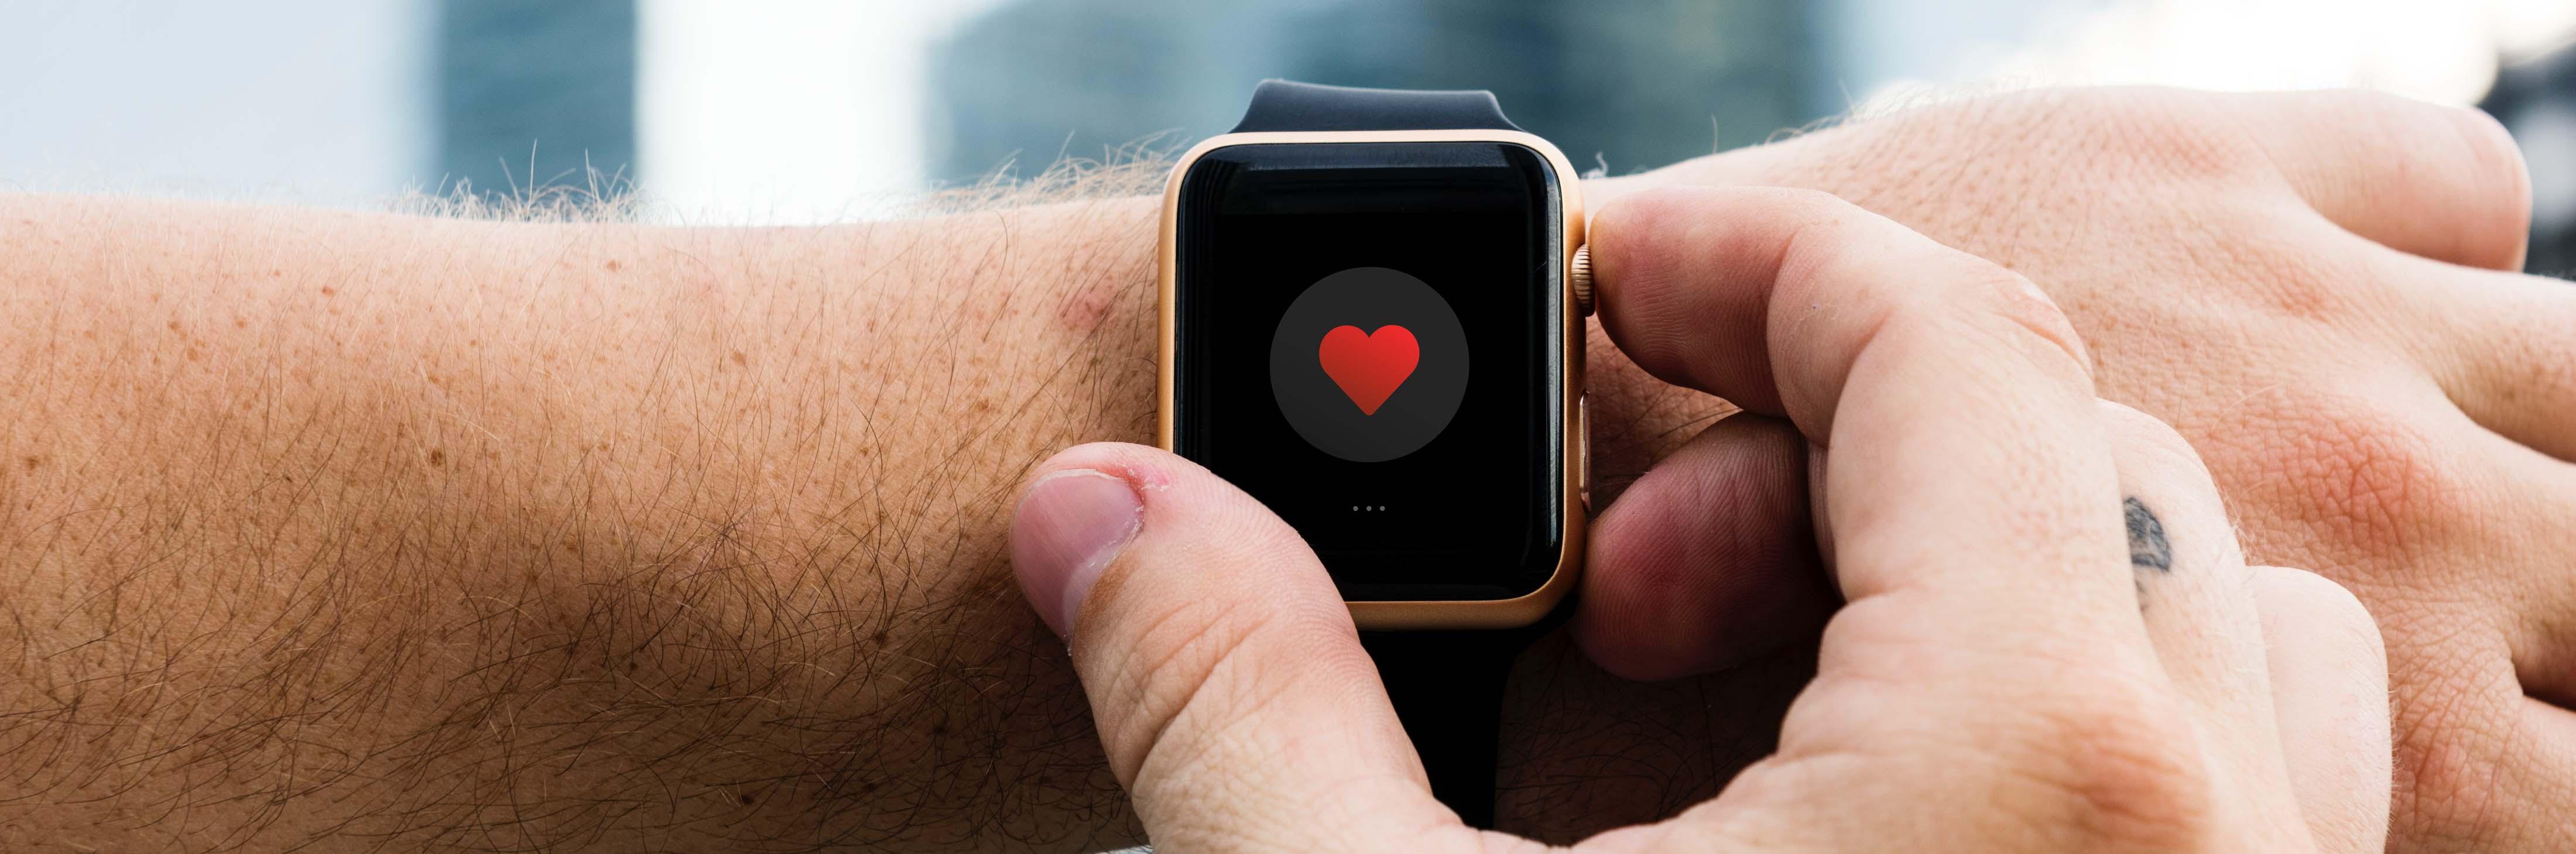 American Heart Month: Heart Disease Risks